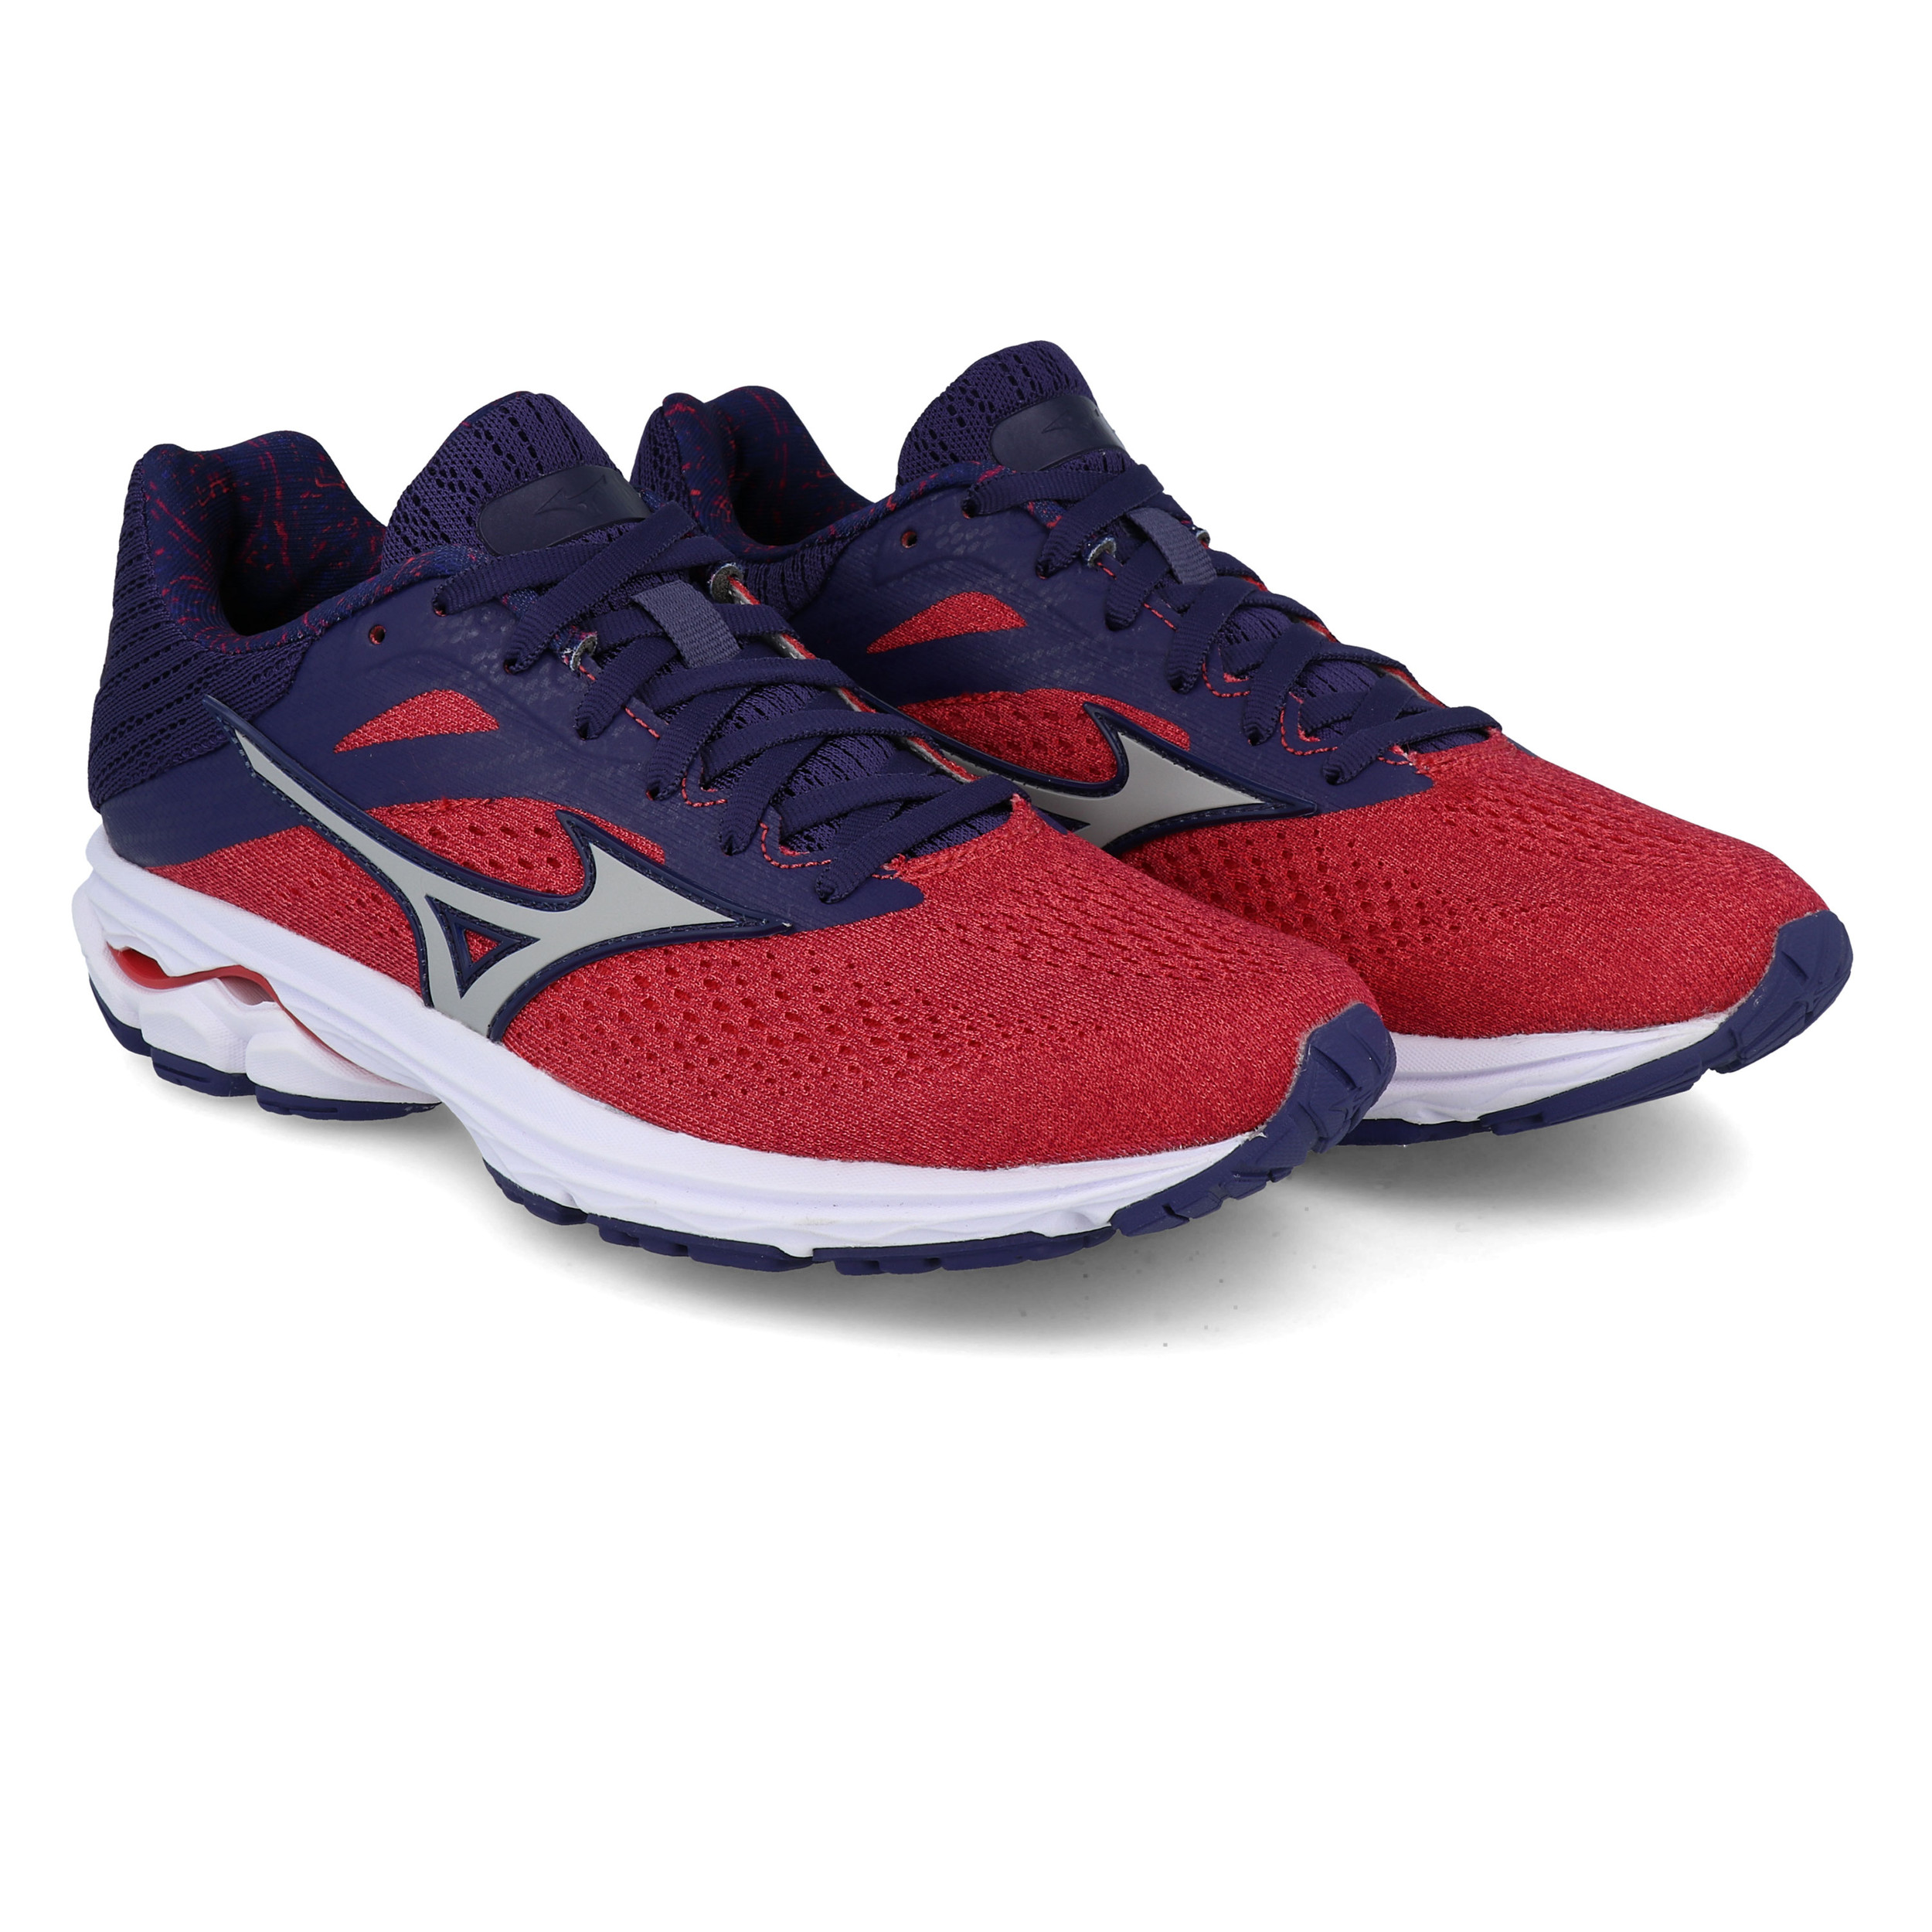 Mizuno Wave Rider 23 Women's Running Shoes